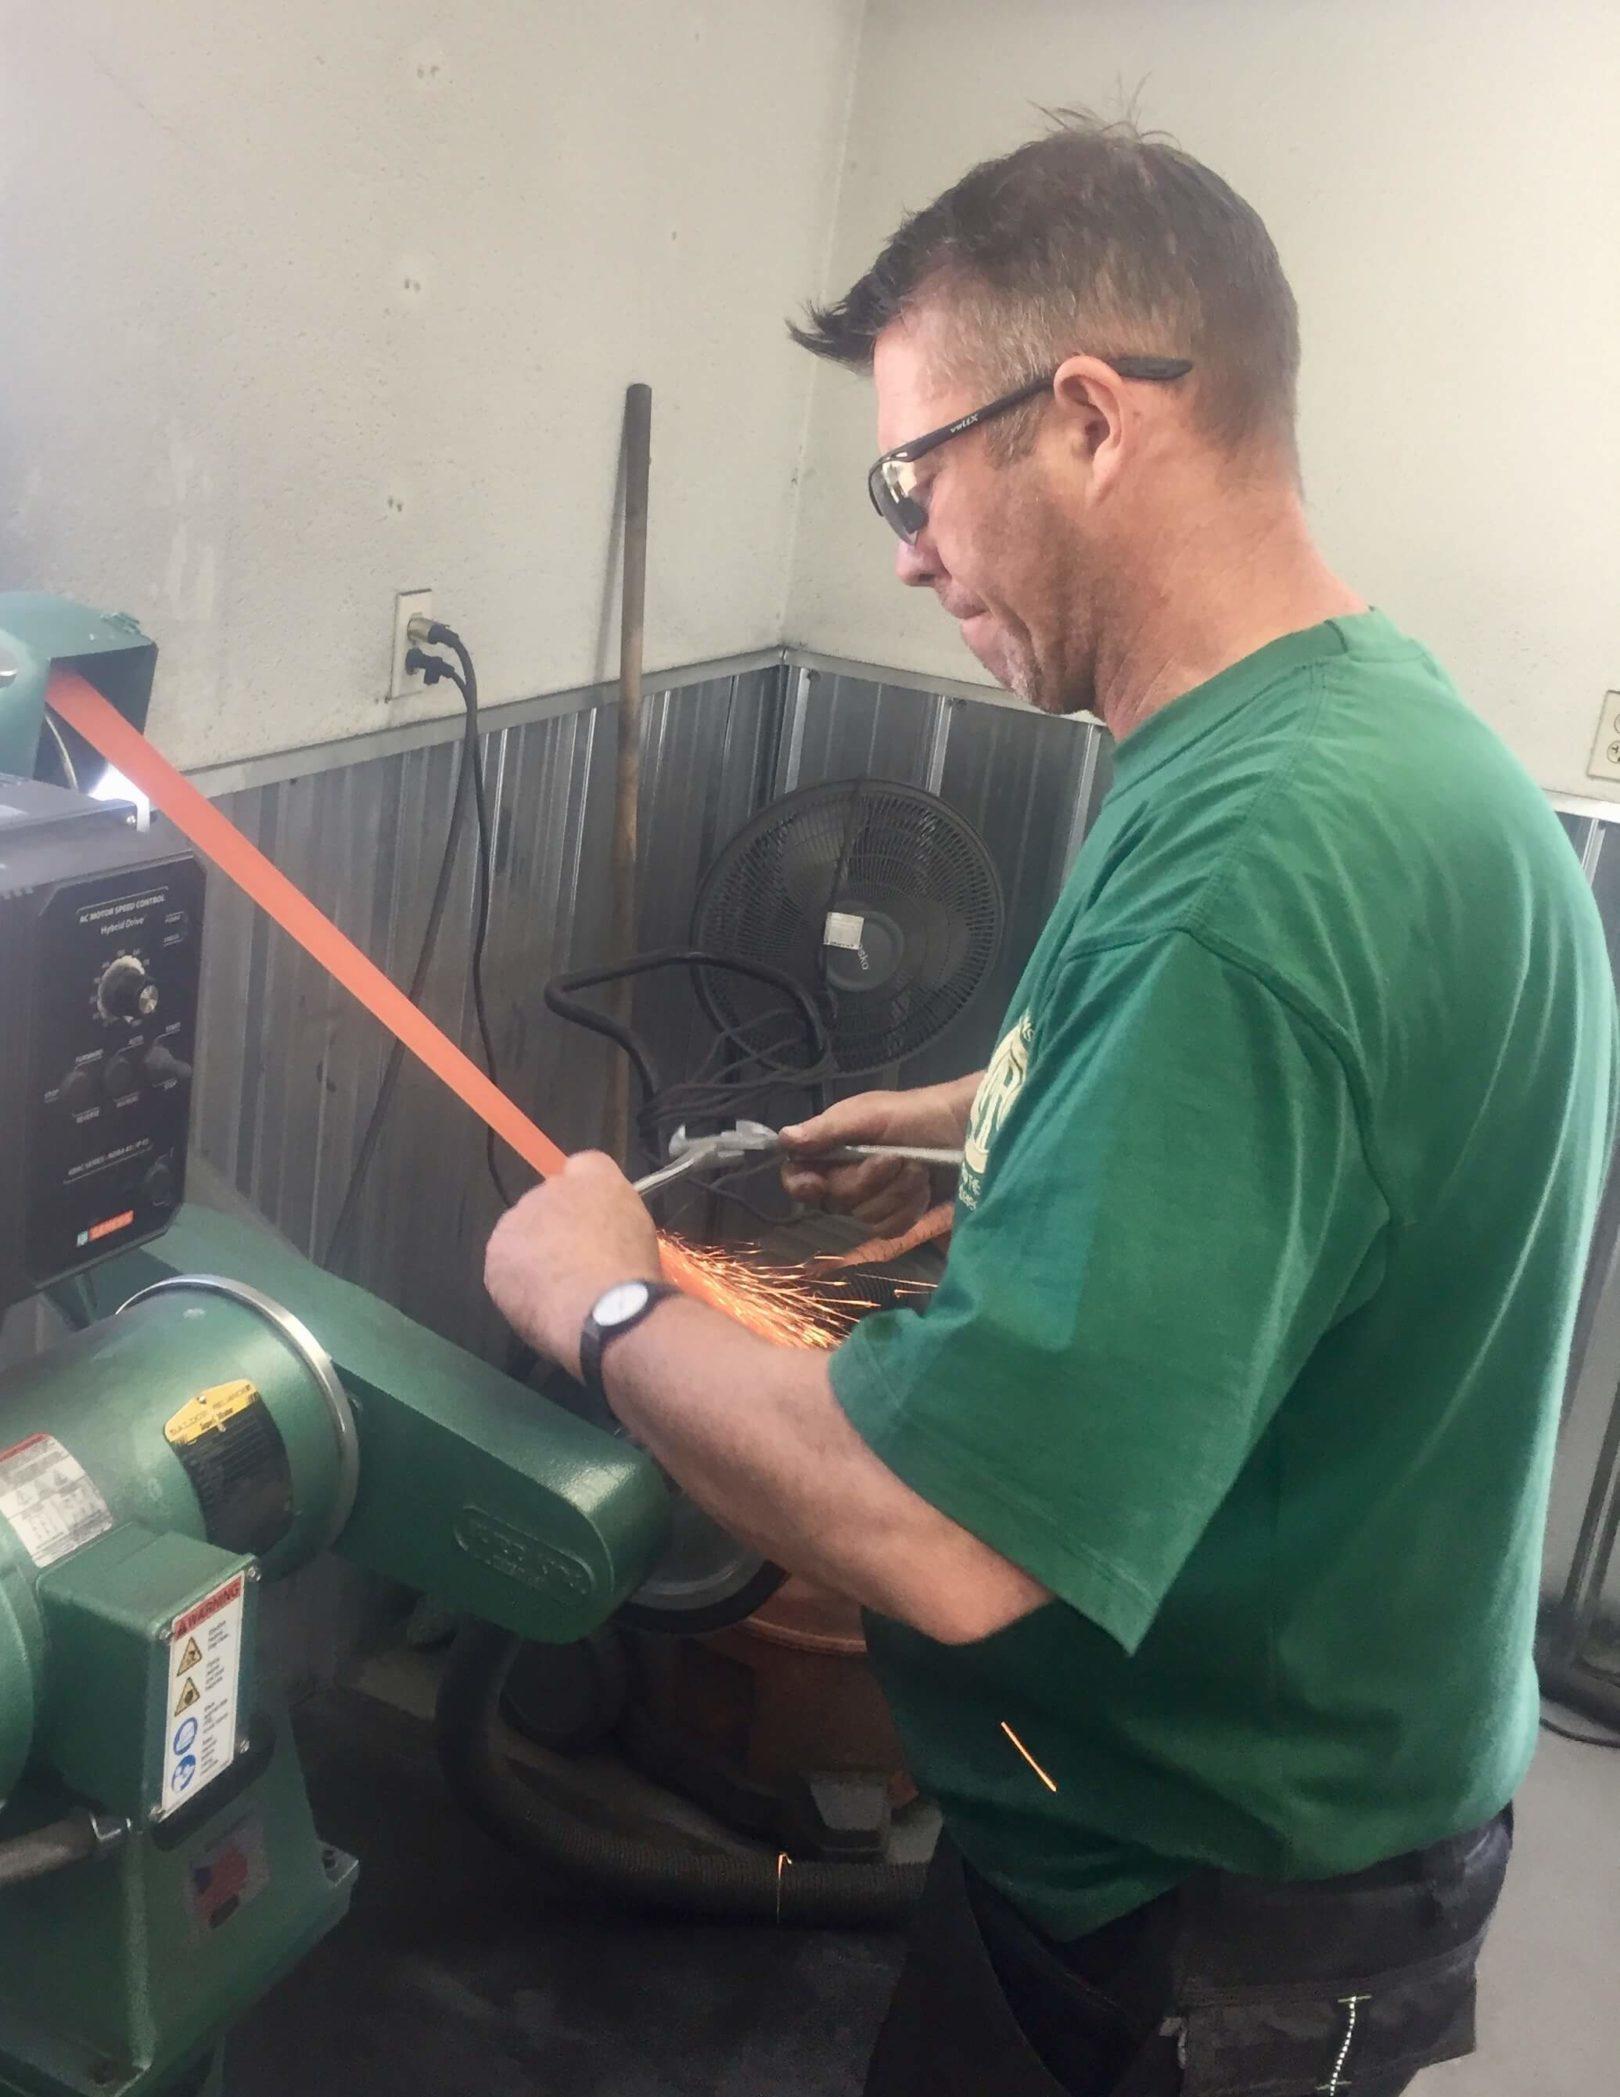 Mark Aikens rebuilding farrier tools